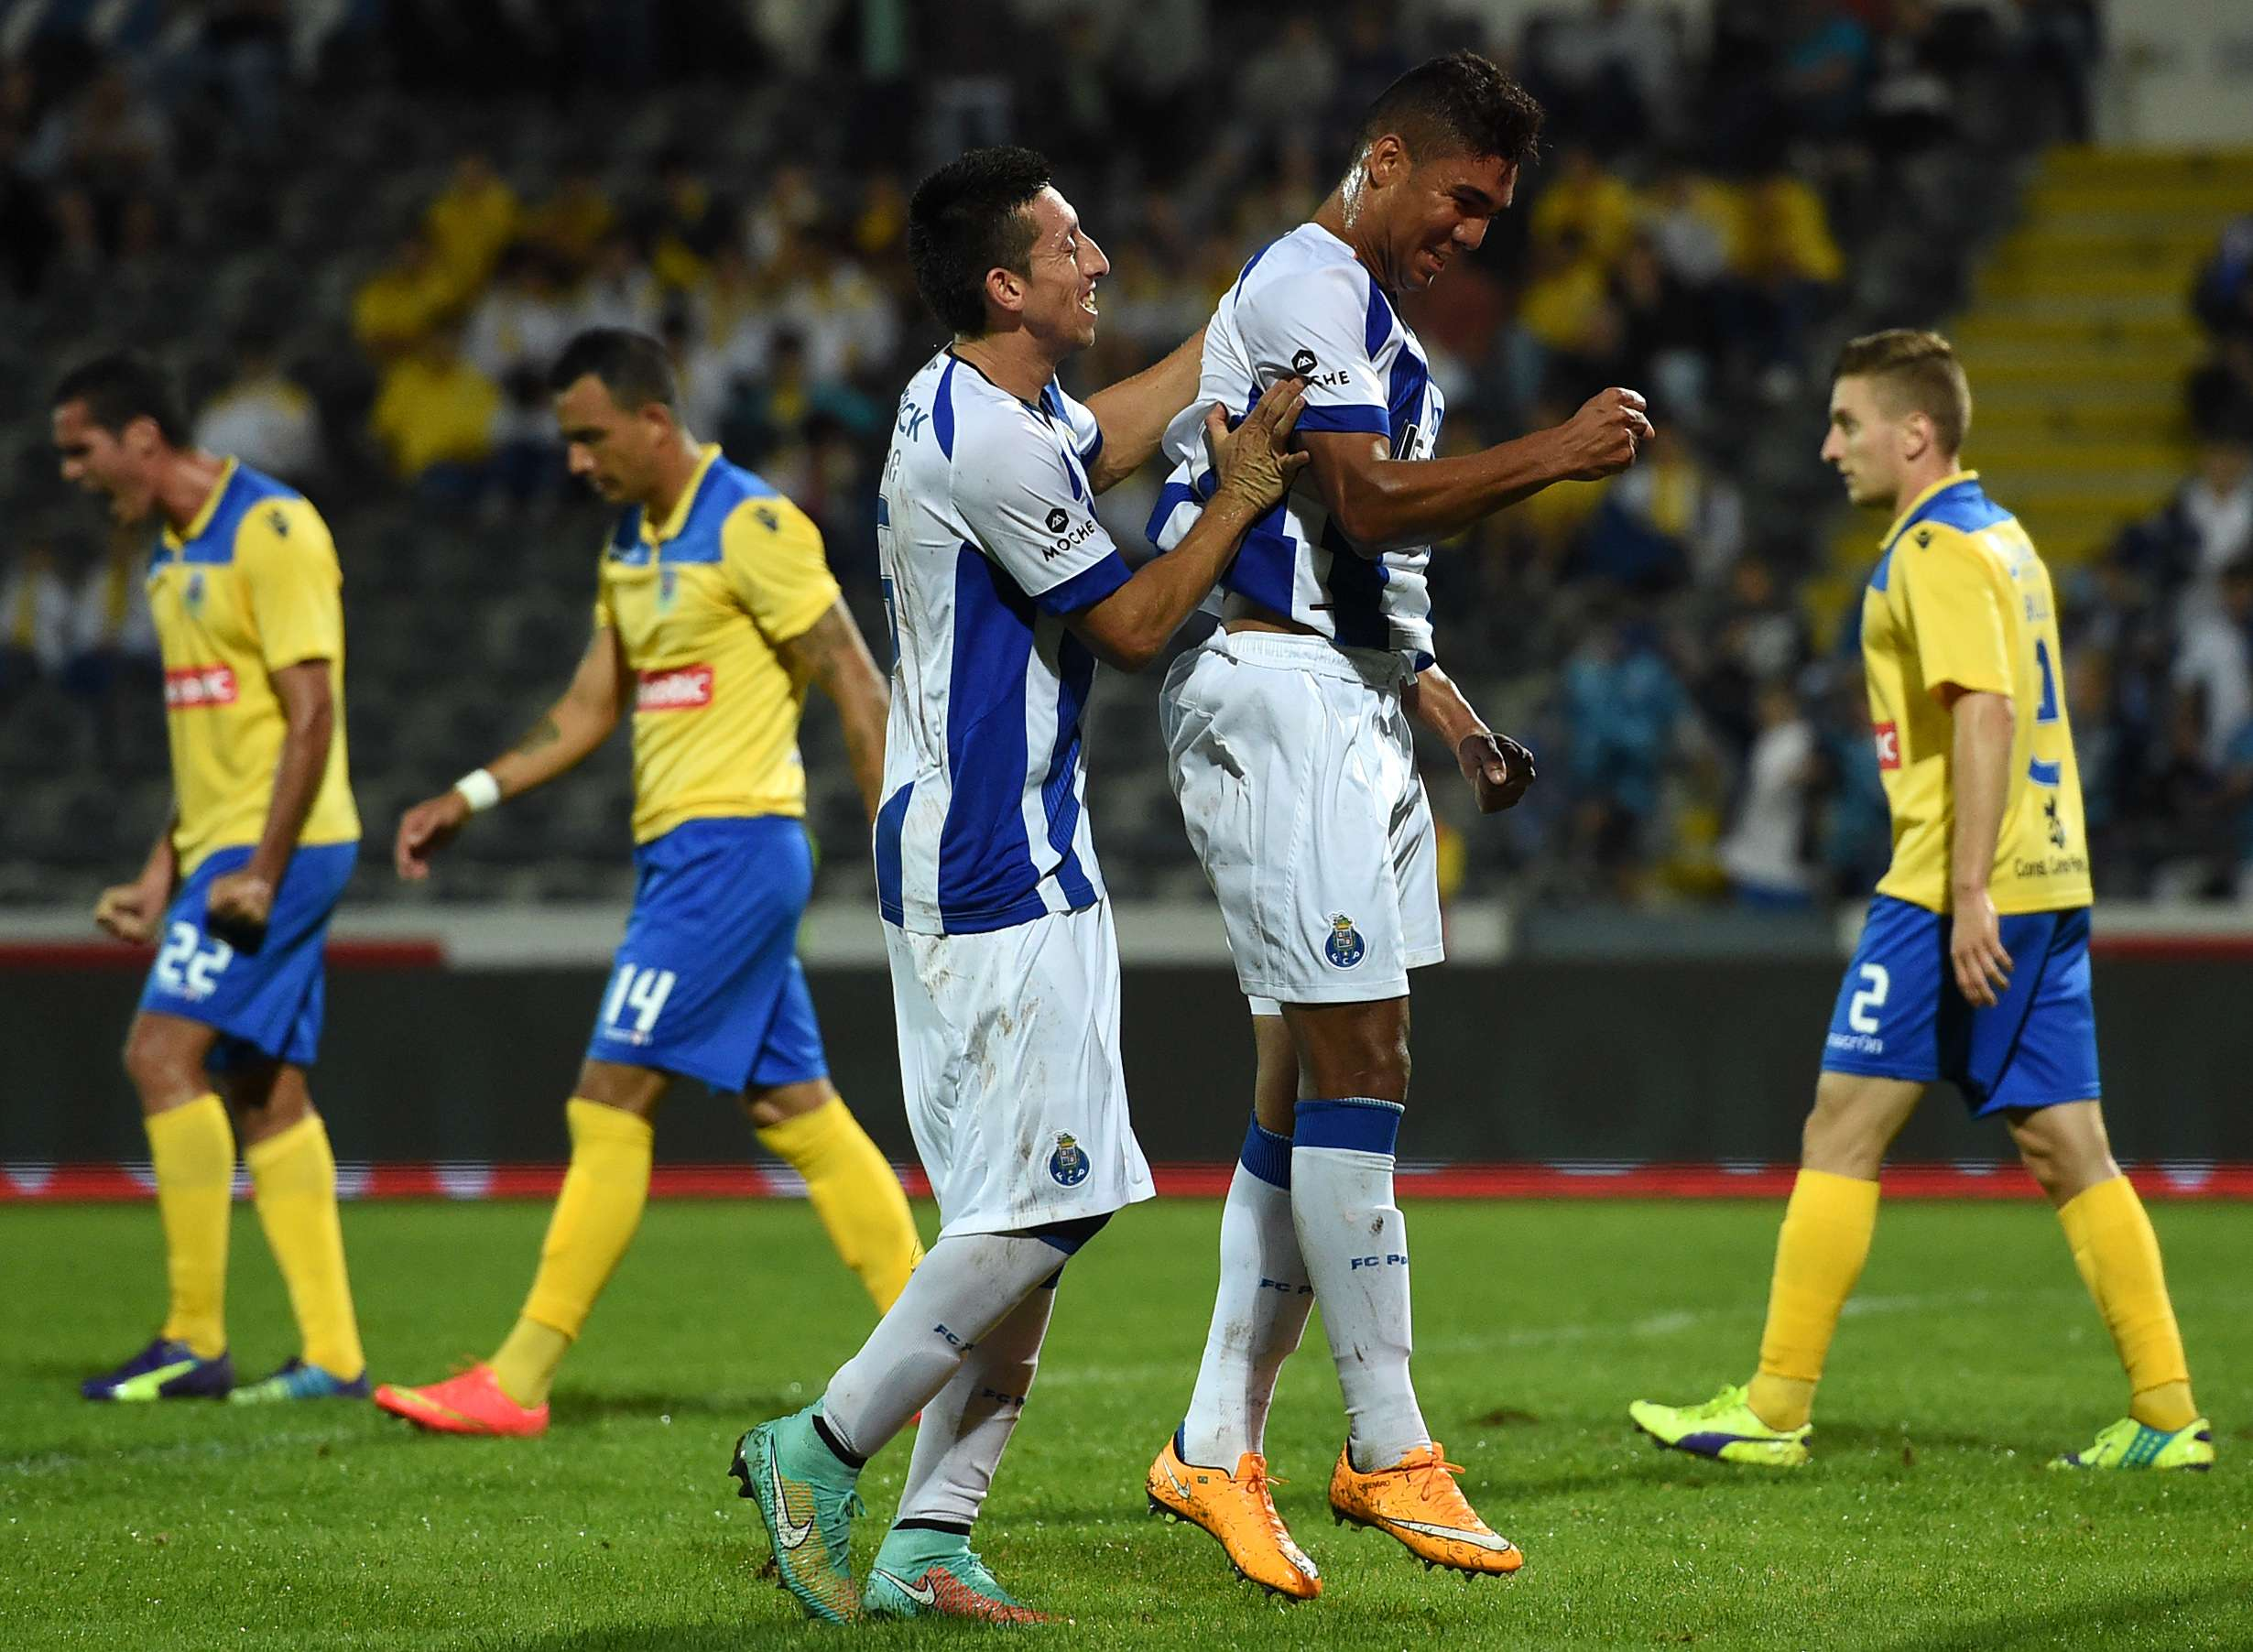 Casemiro comemora seu gol contra o Arouca Foto: Francisco Leong/AFP